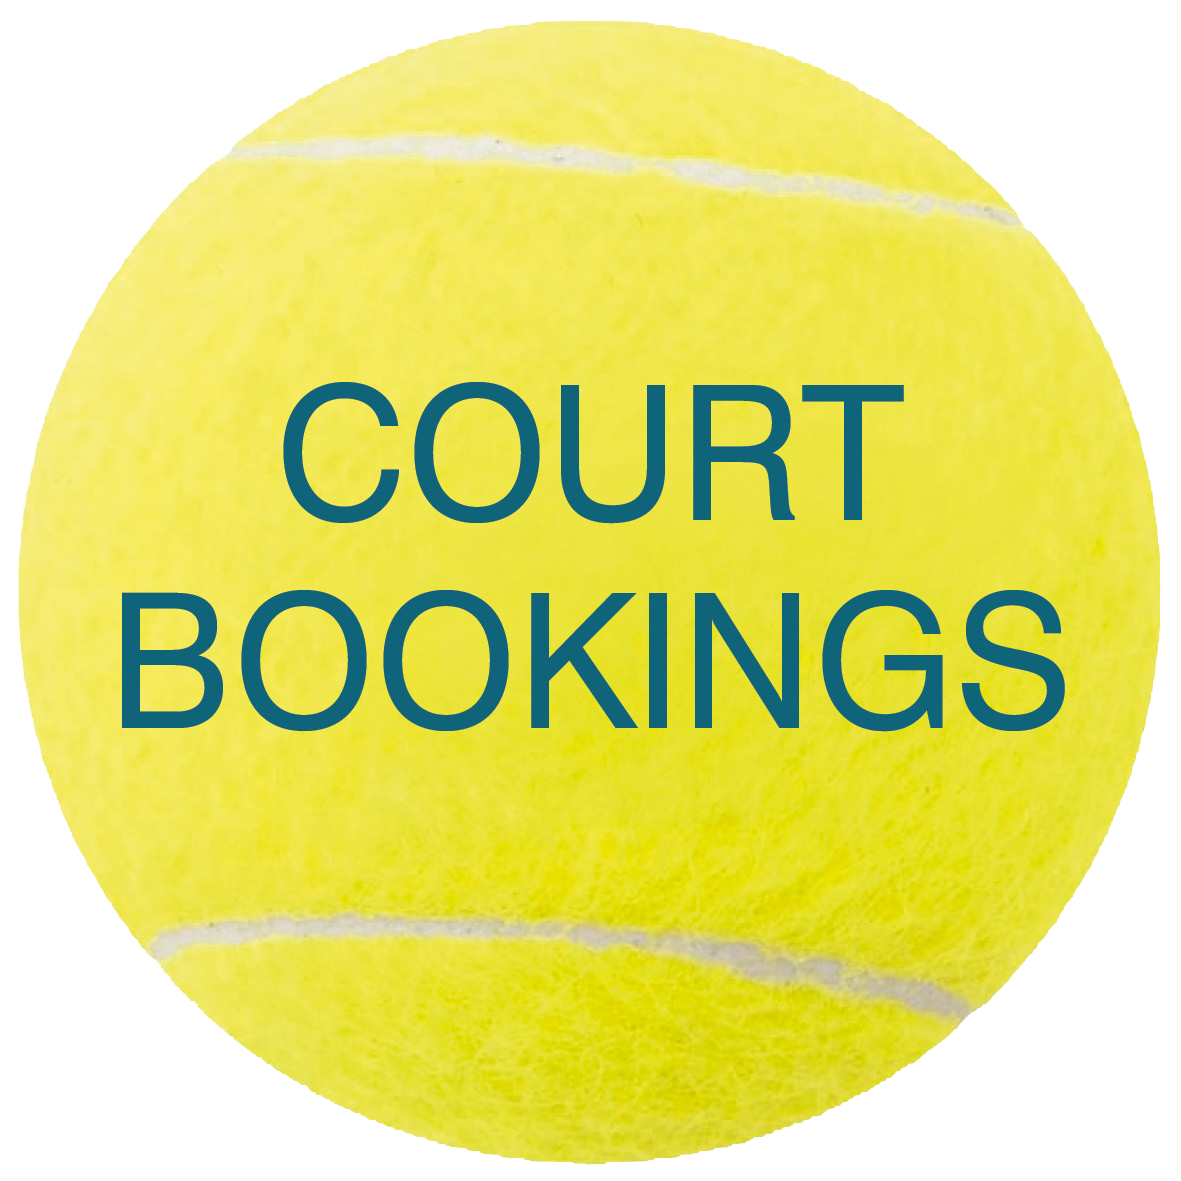 Tennis court bookings